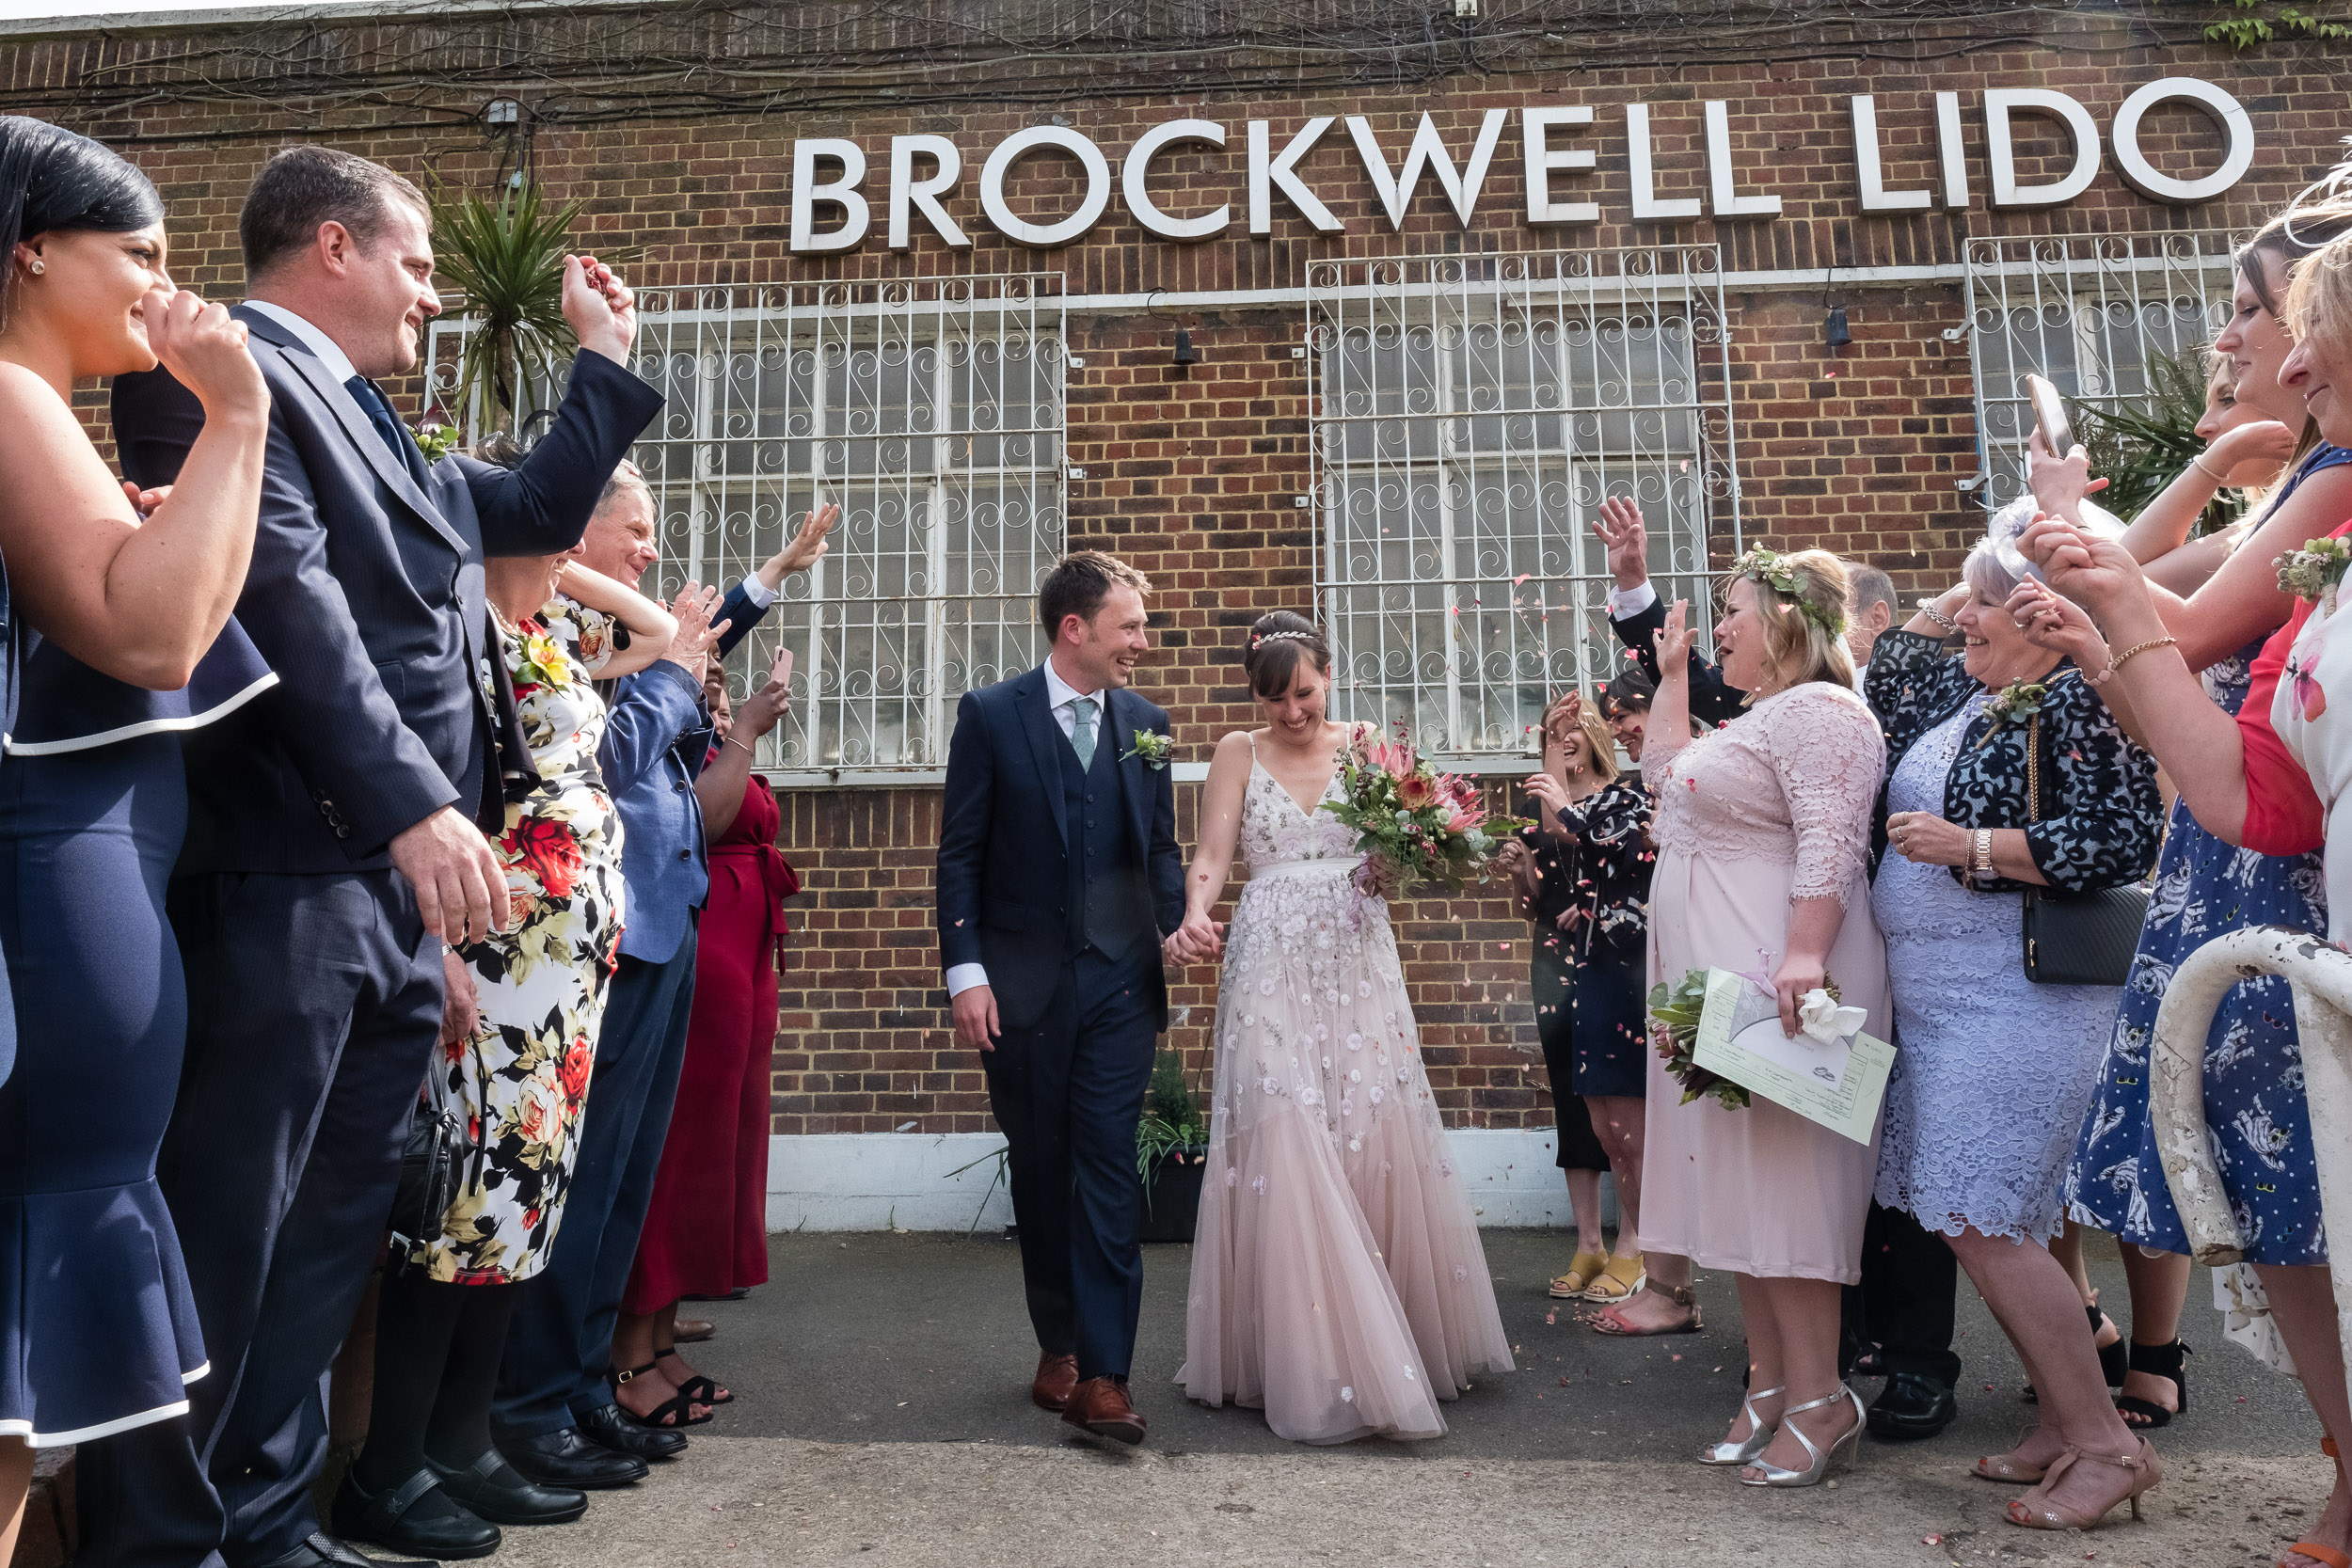 brockwell-lido-brixton-herne-hill-wedding-206.jpg